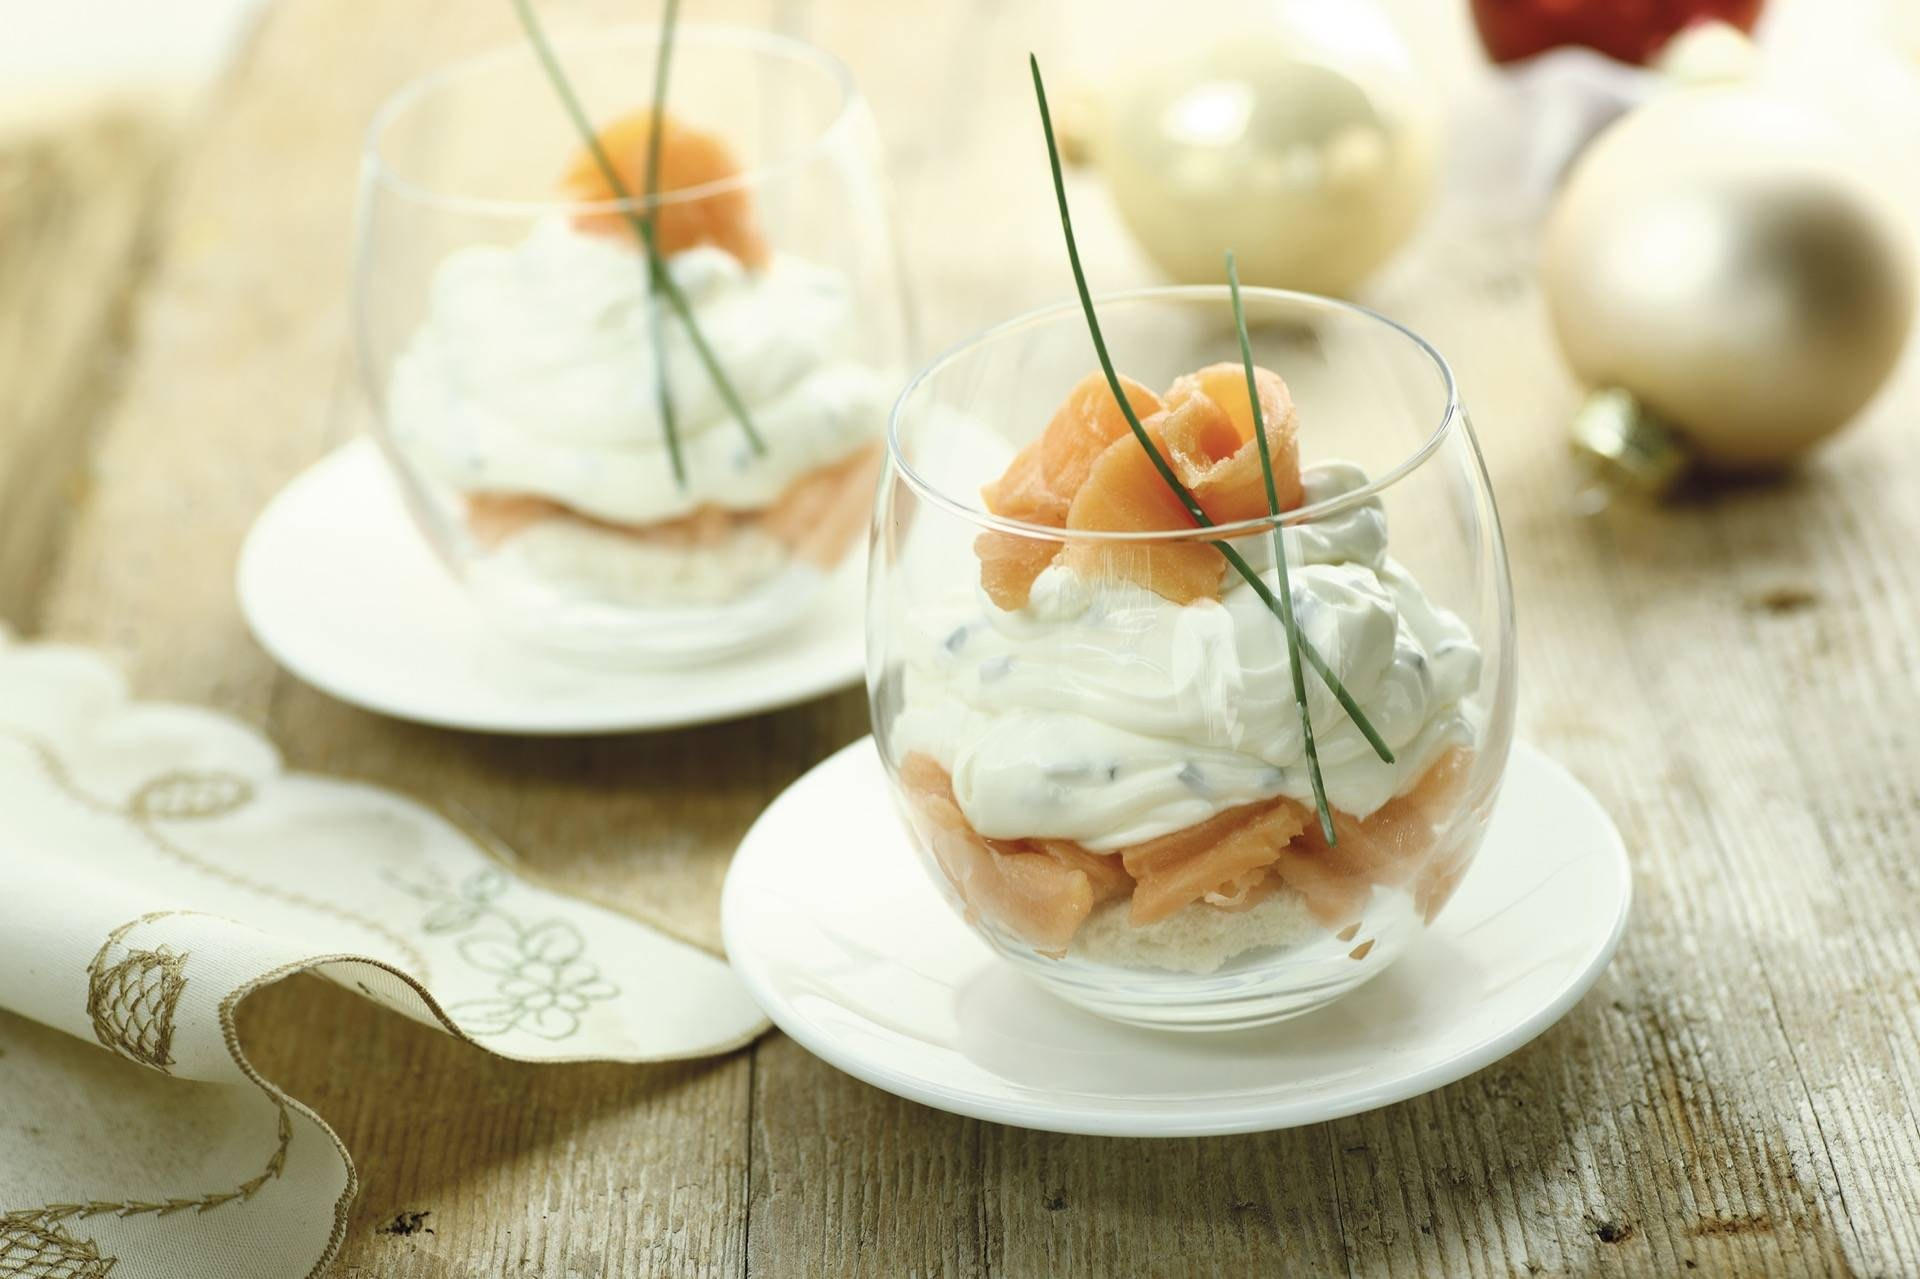 Tiramisù salato ai due salmoni - Parmalat